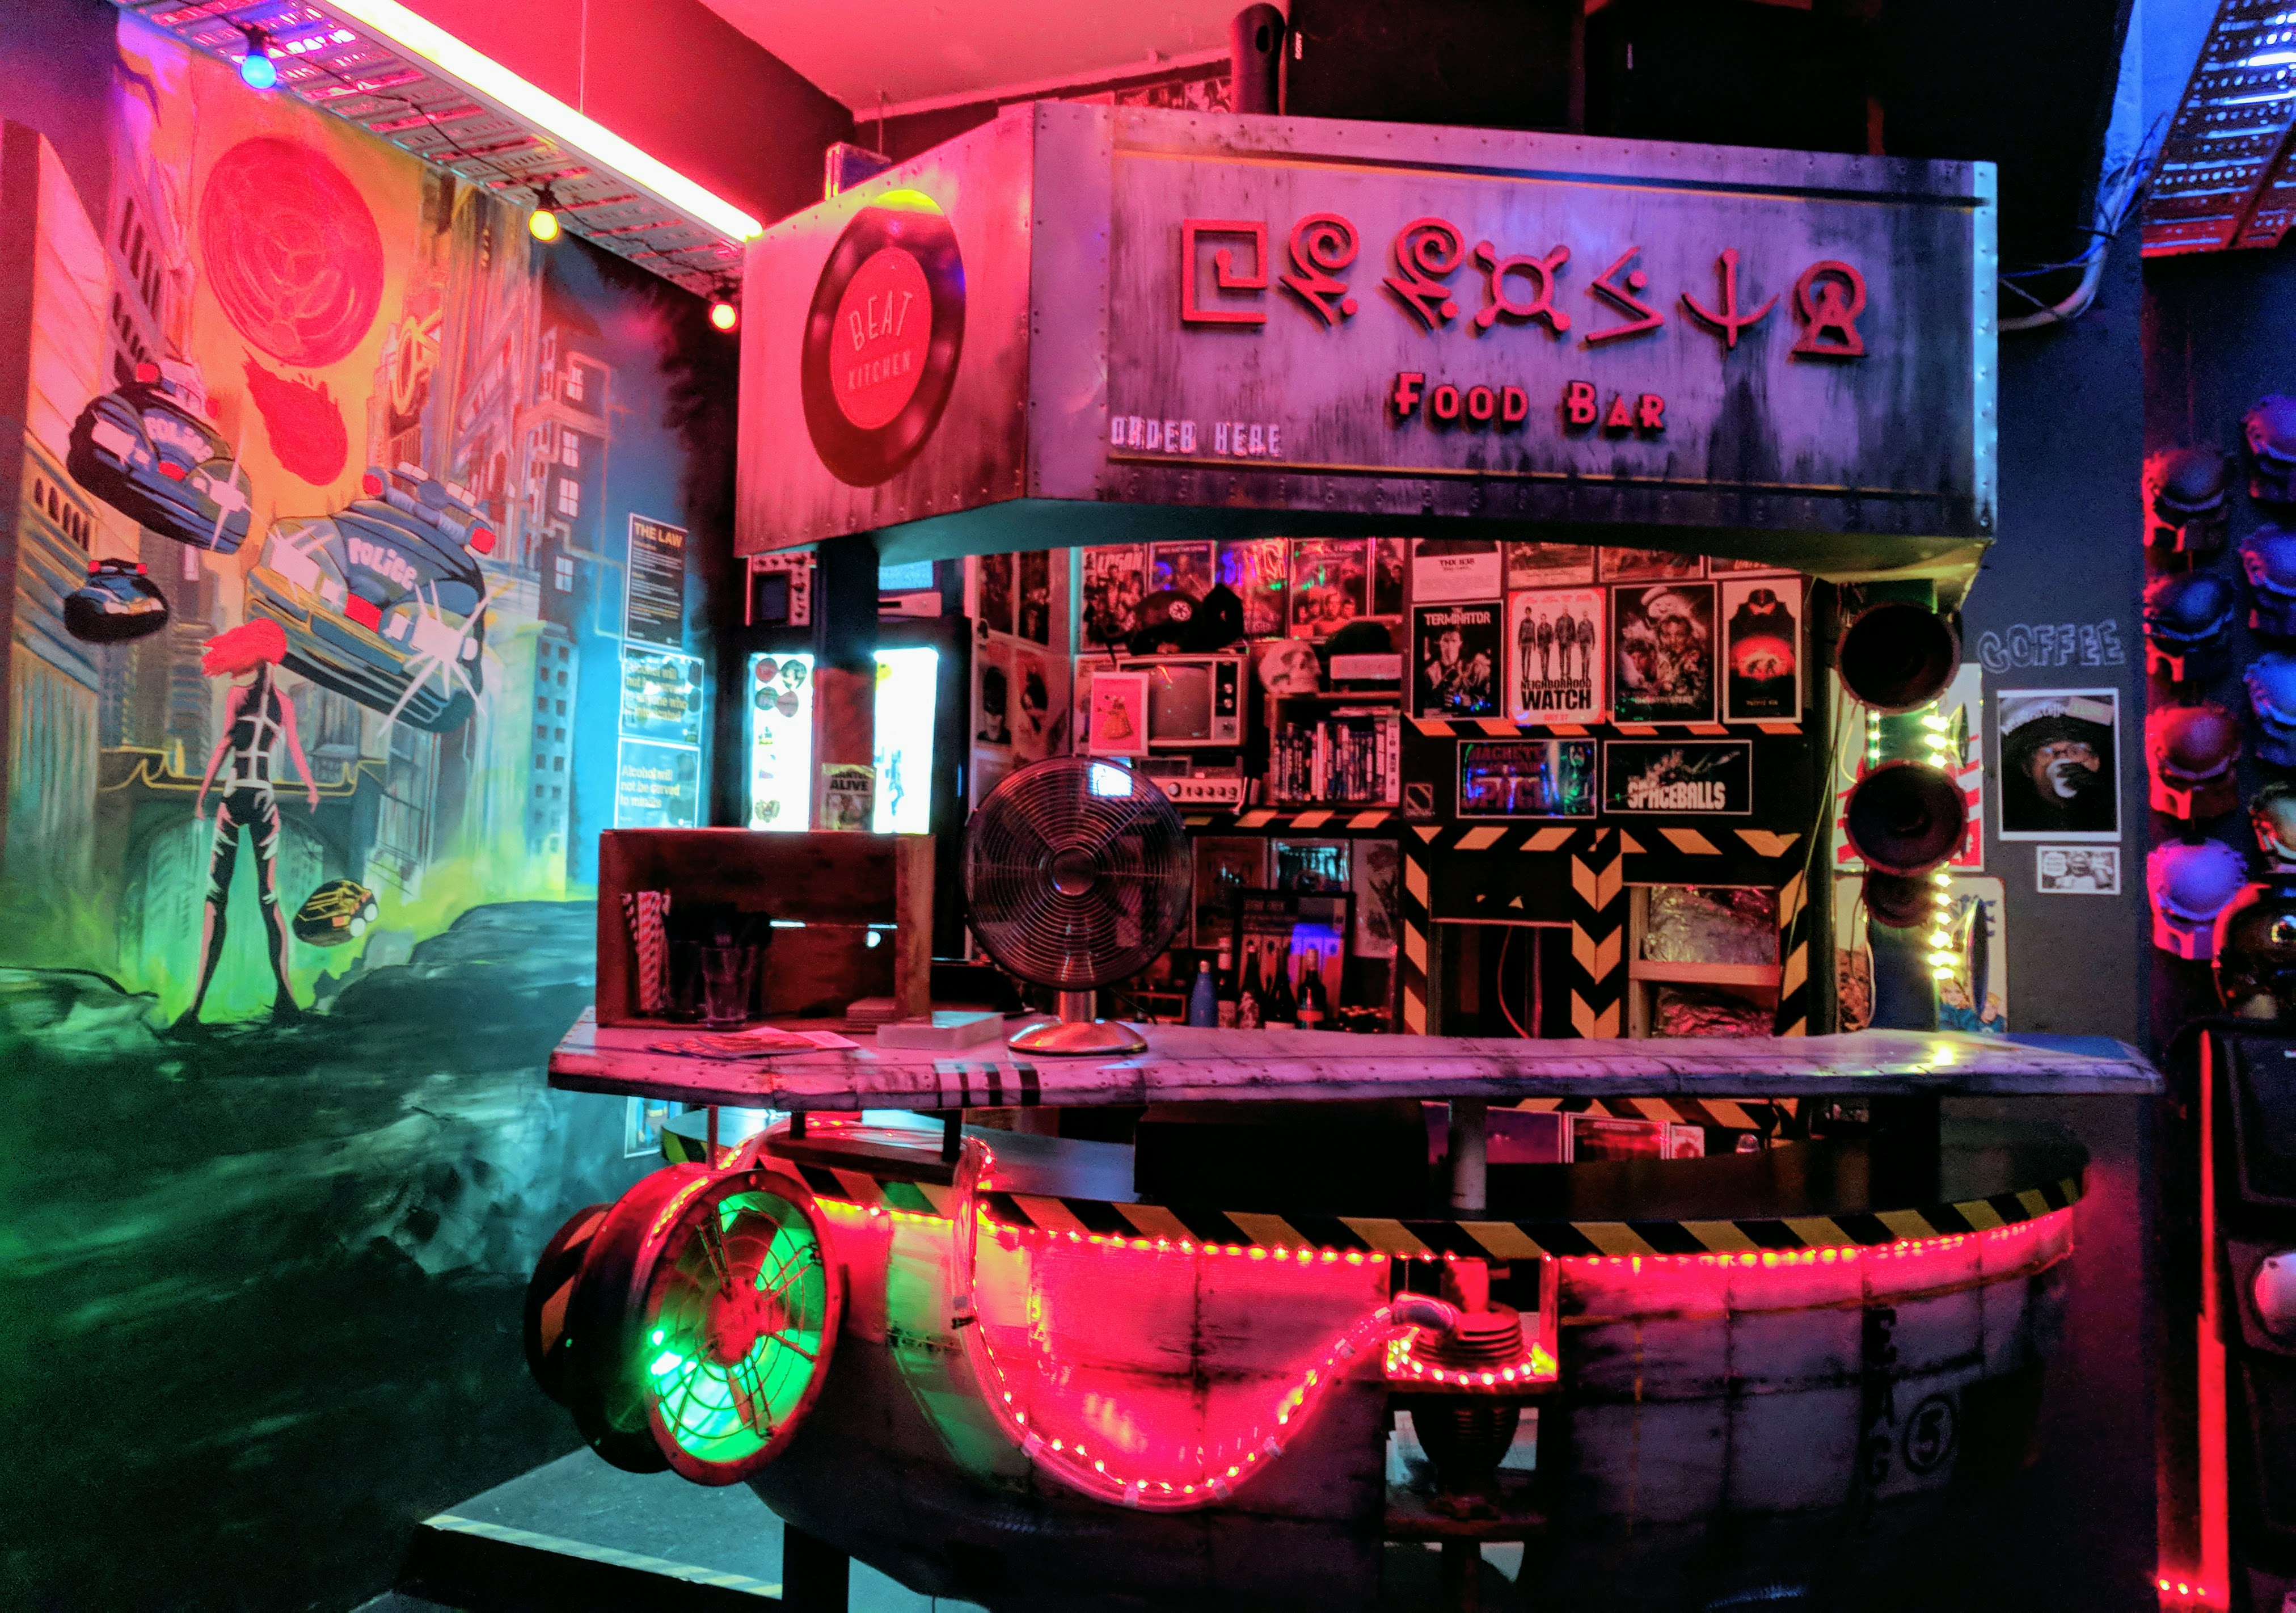 Food Bar at Photonflux (closed Wellington bar)